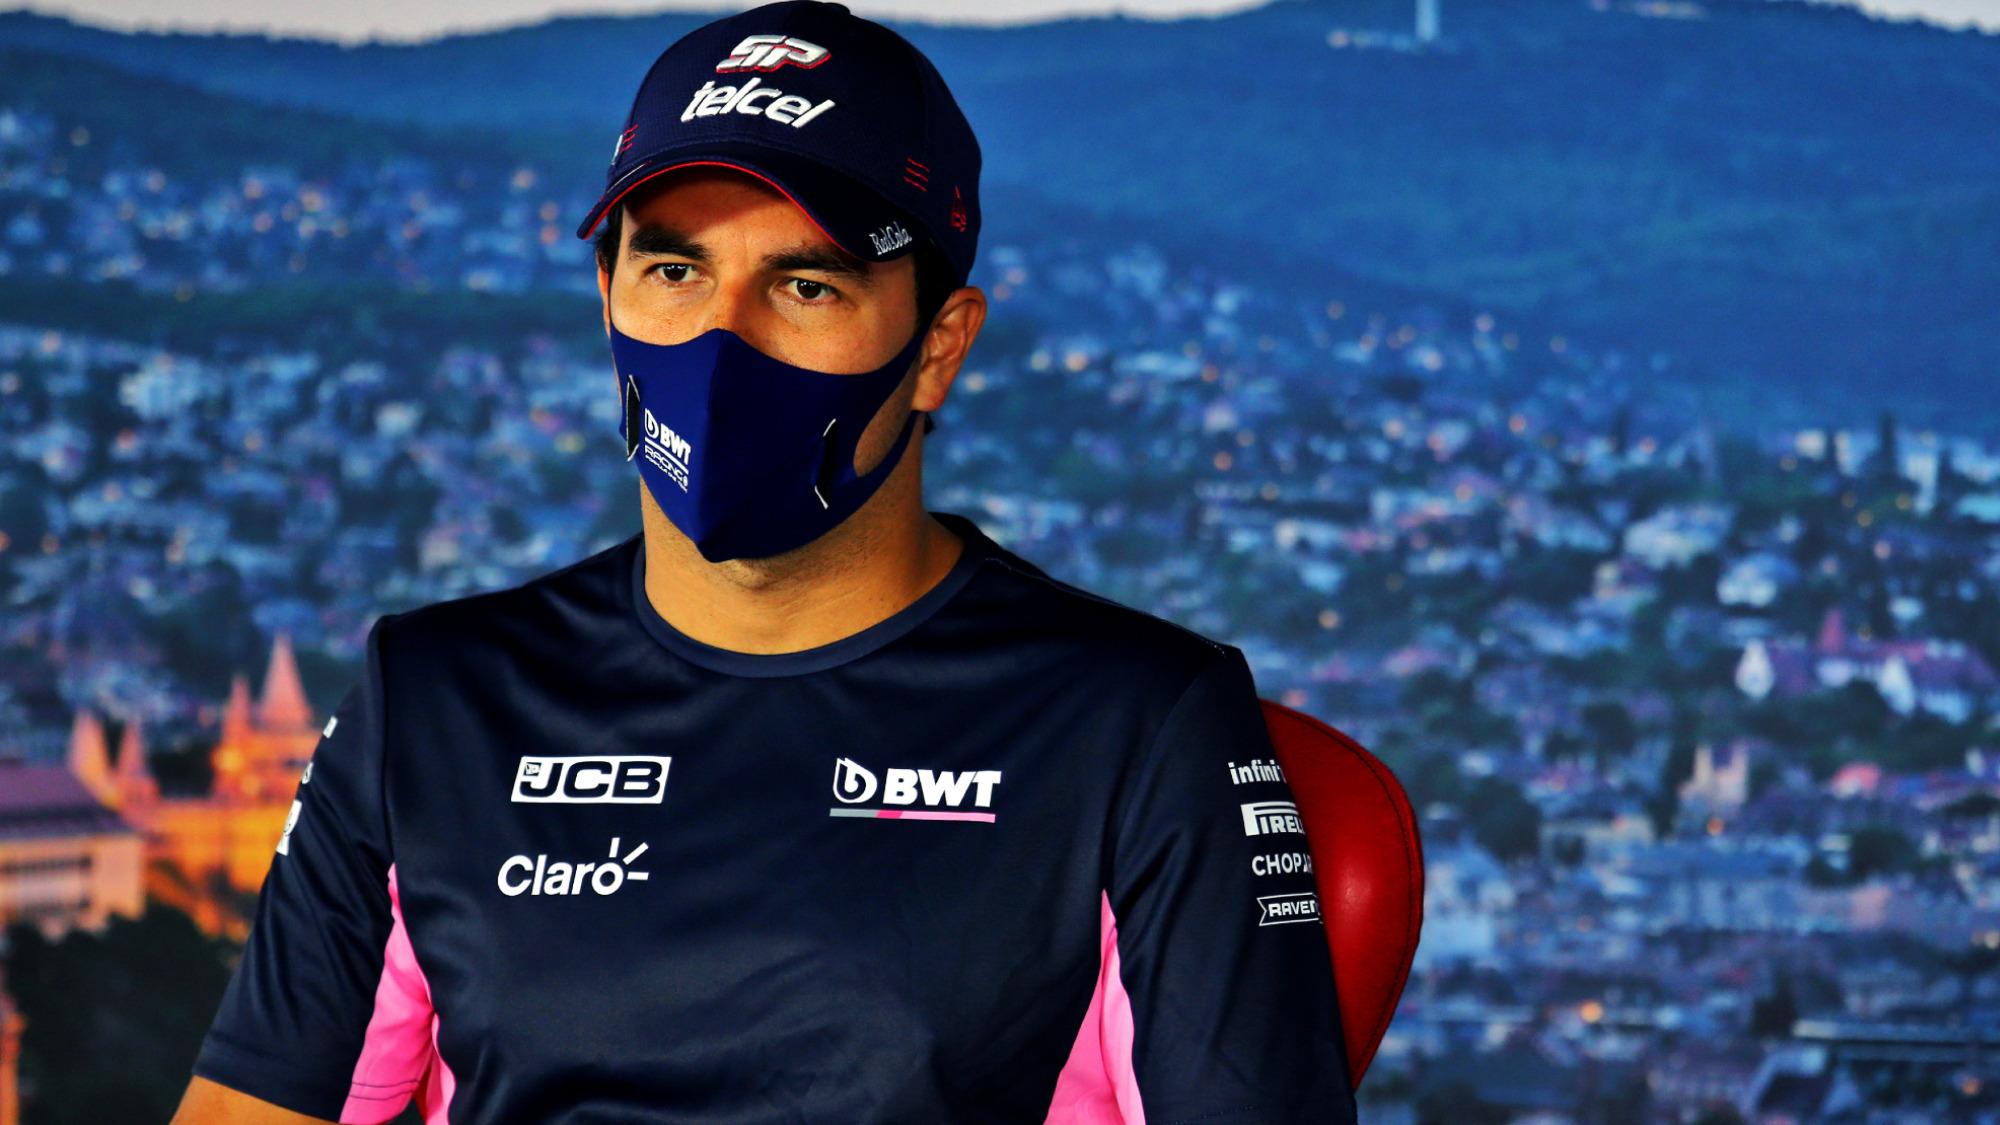 Sergio Perez, Racing Point, 2020 Hungarian GP